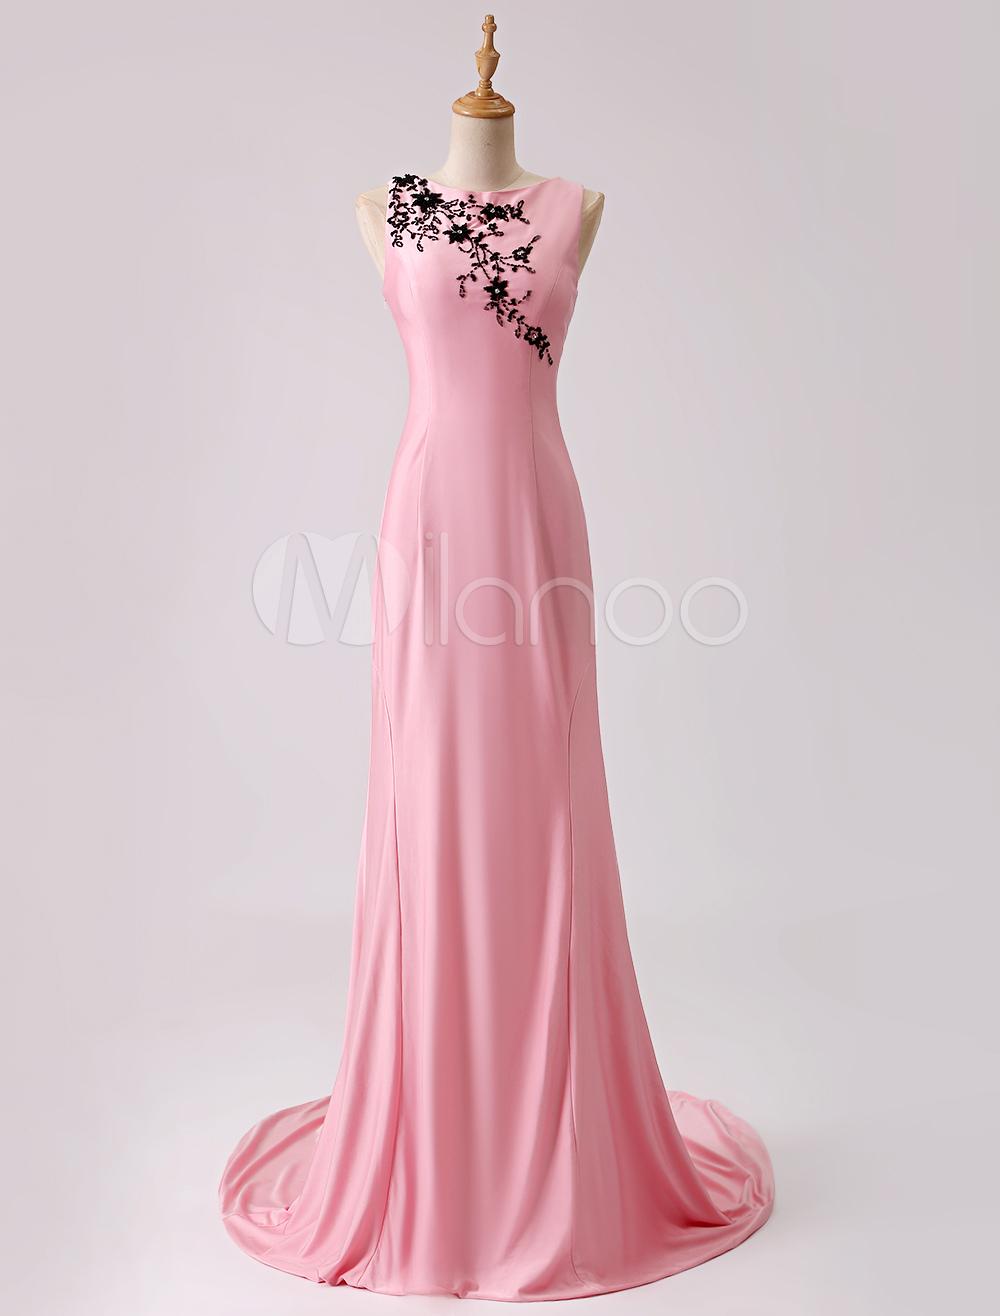 Pink Jewel Neck Beading Evening Dress With Train (Wedding Evening Dresses) photo